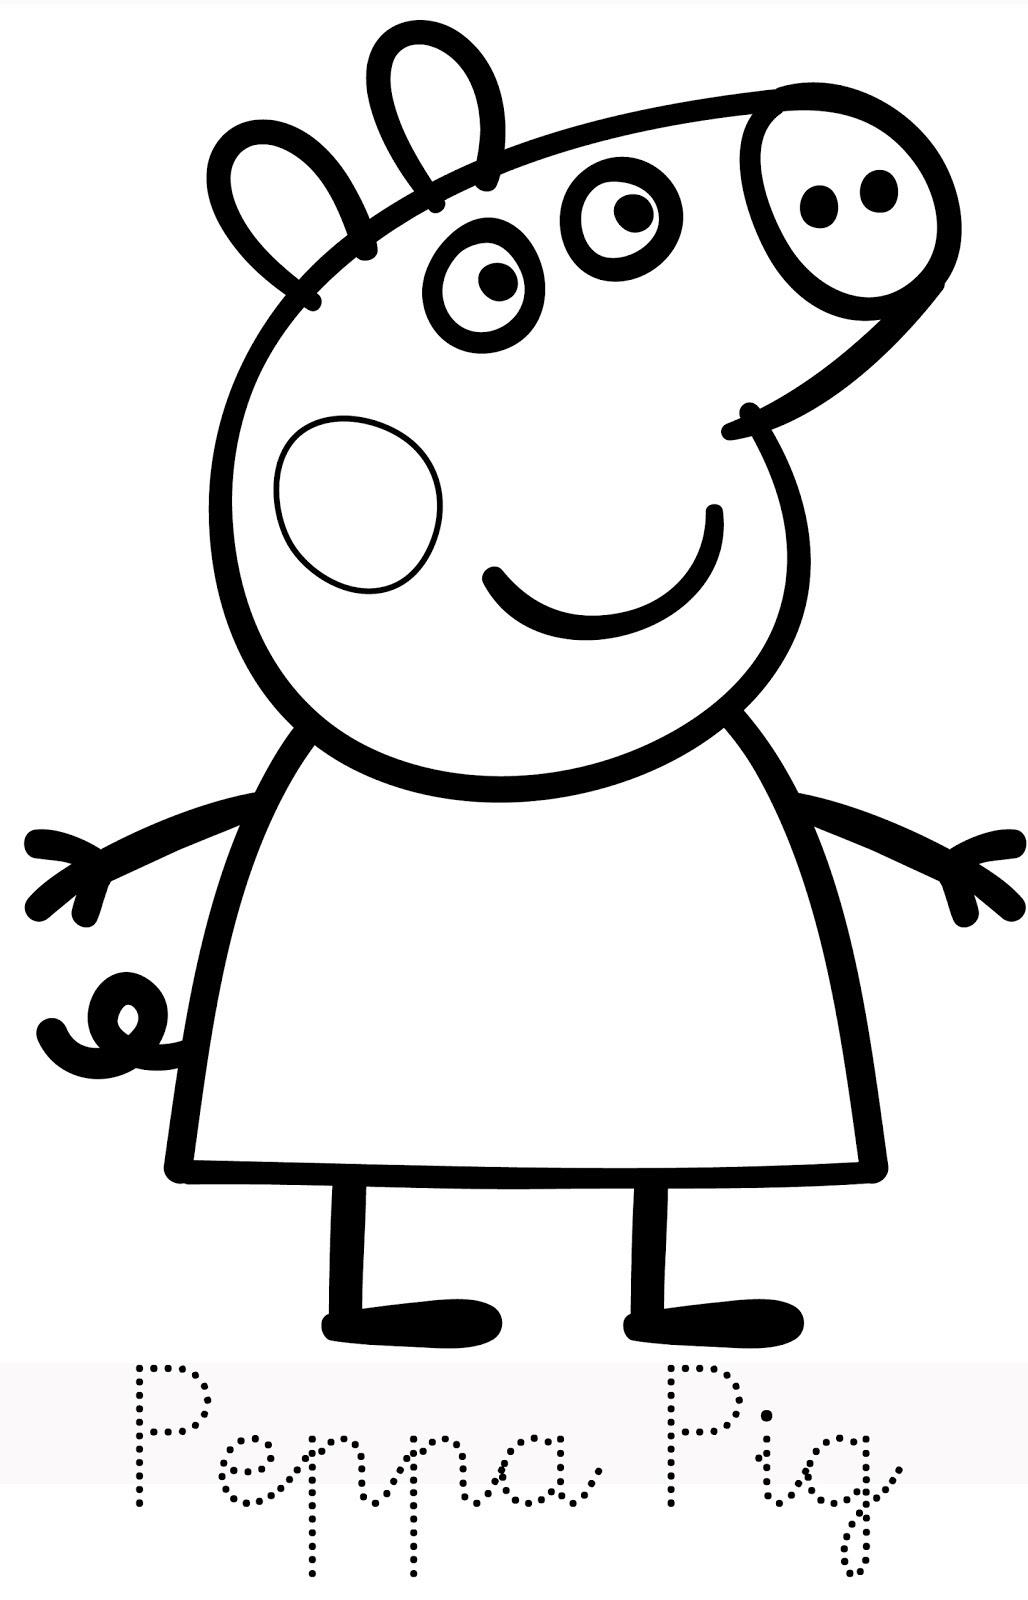 Peppa Pig George Coloring Pages At Getcoloringscom Free Printable